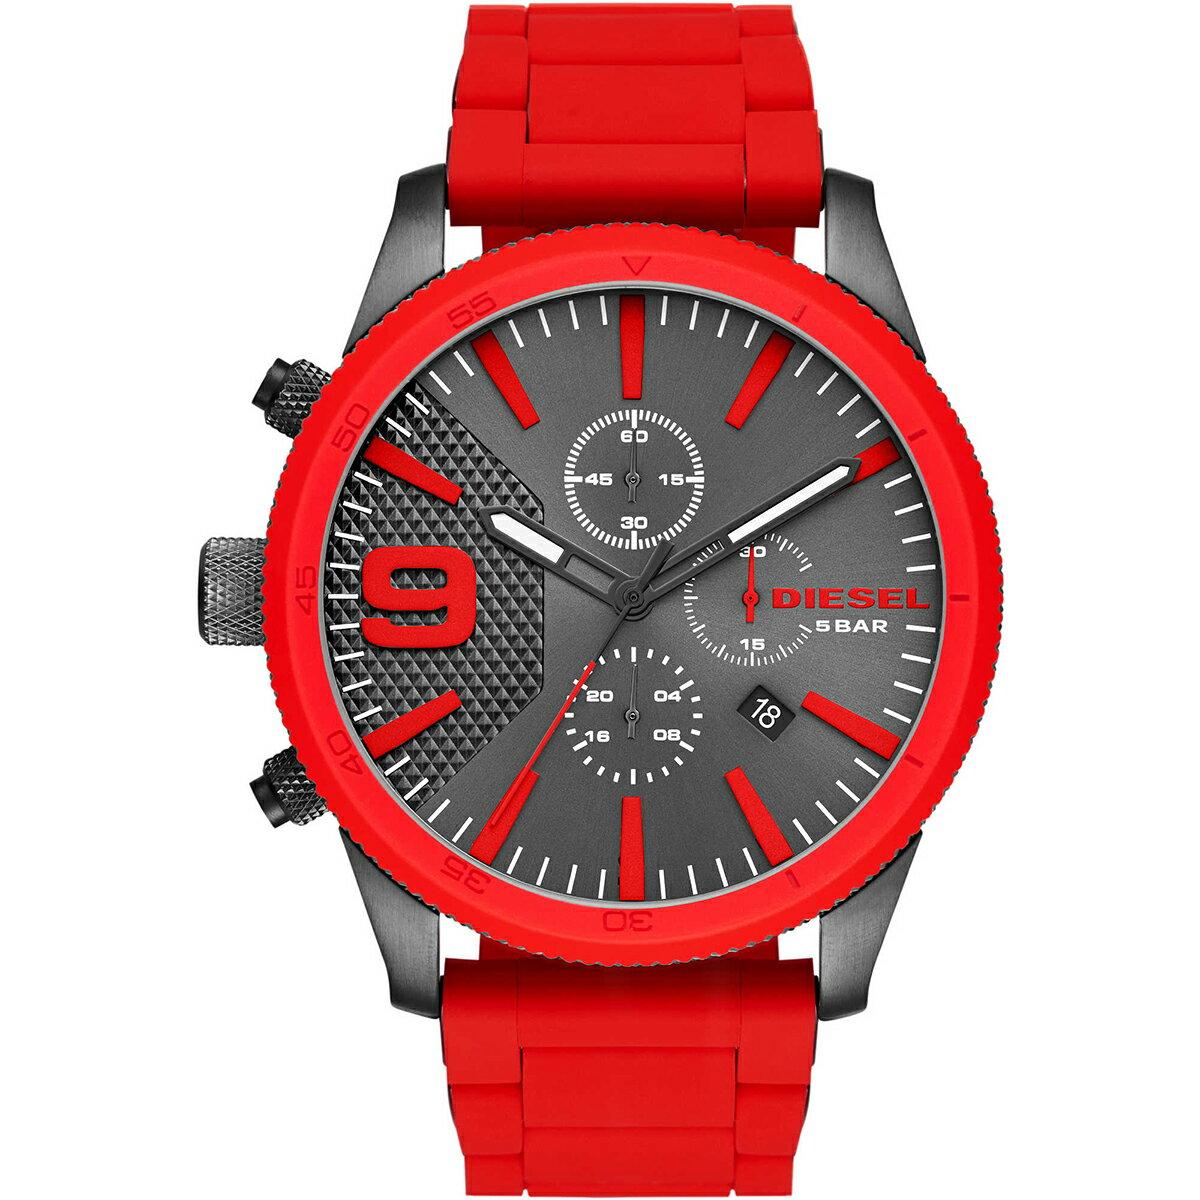 DIESEL ディーゼル DZ4448 RASP ラプス 腕時計 [海外正規商品][送料無料][あす楽]